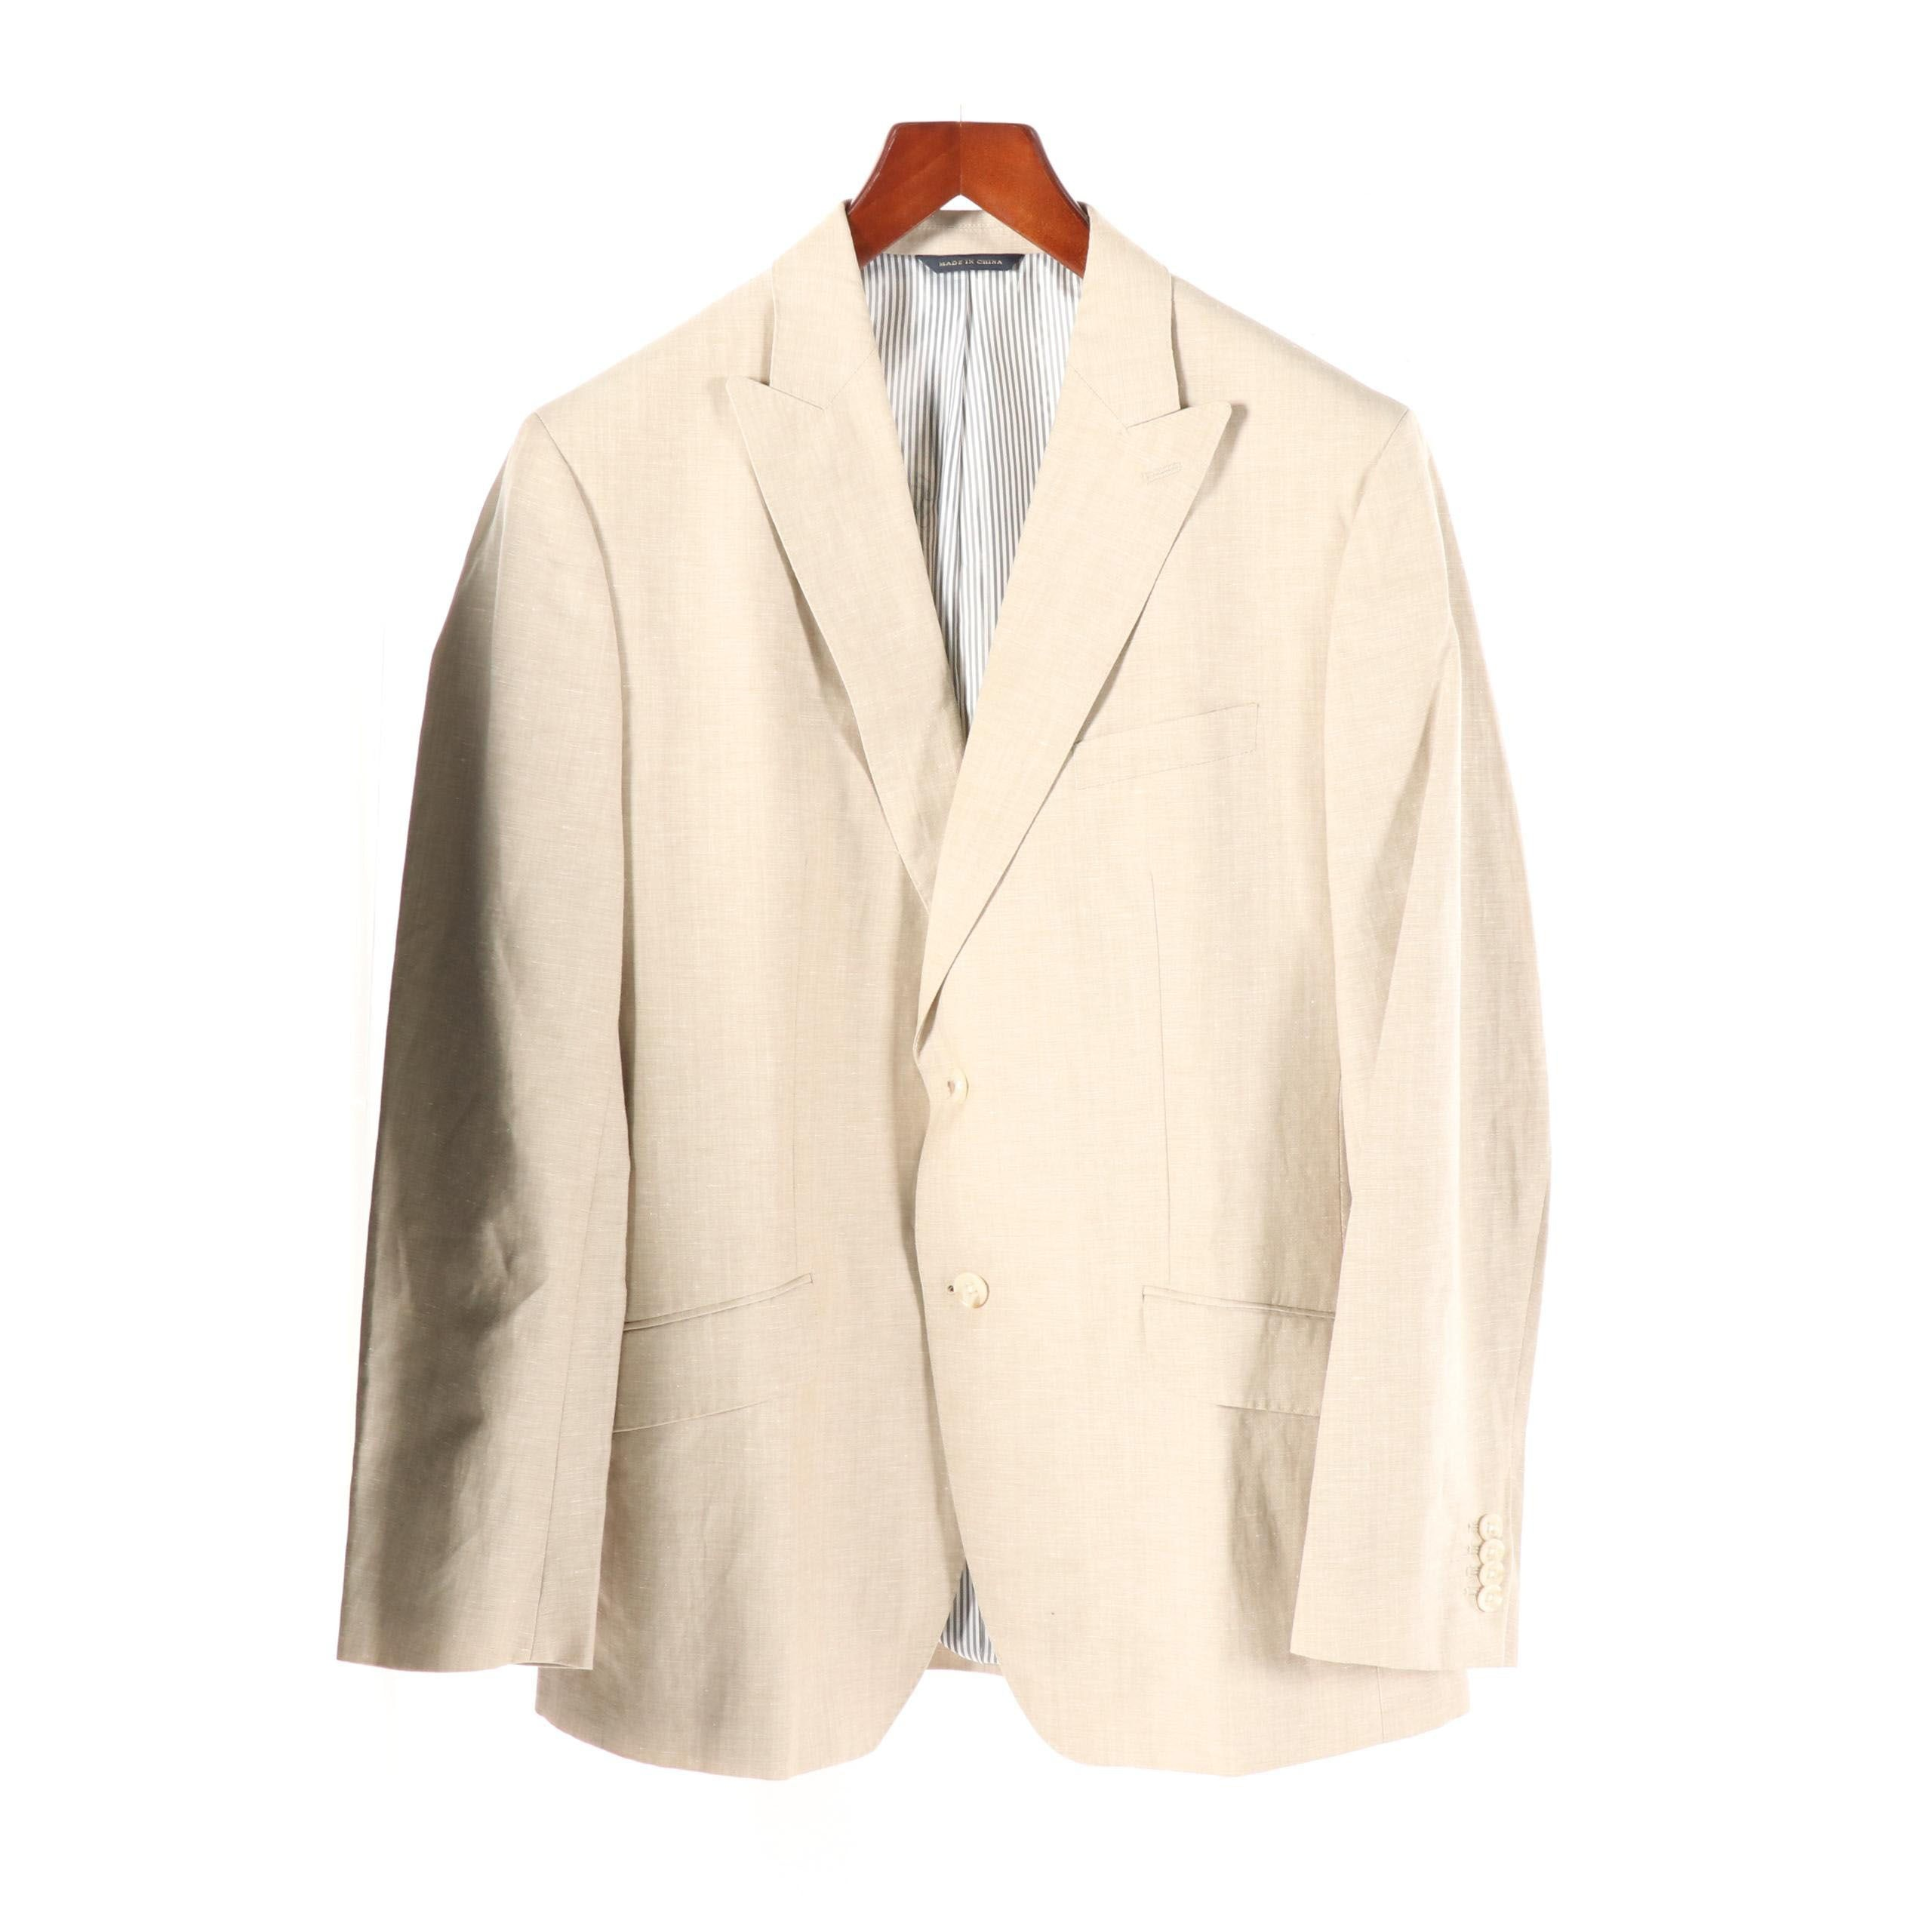 Men's Banana Republic Tailored Fit Linen Blend Jacket